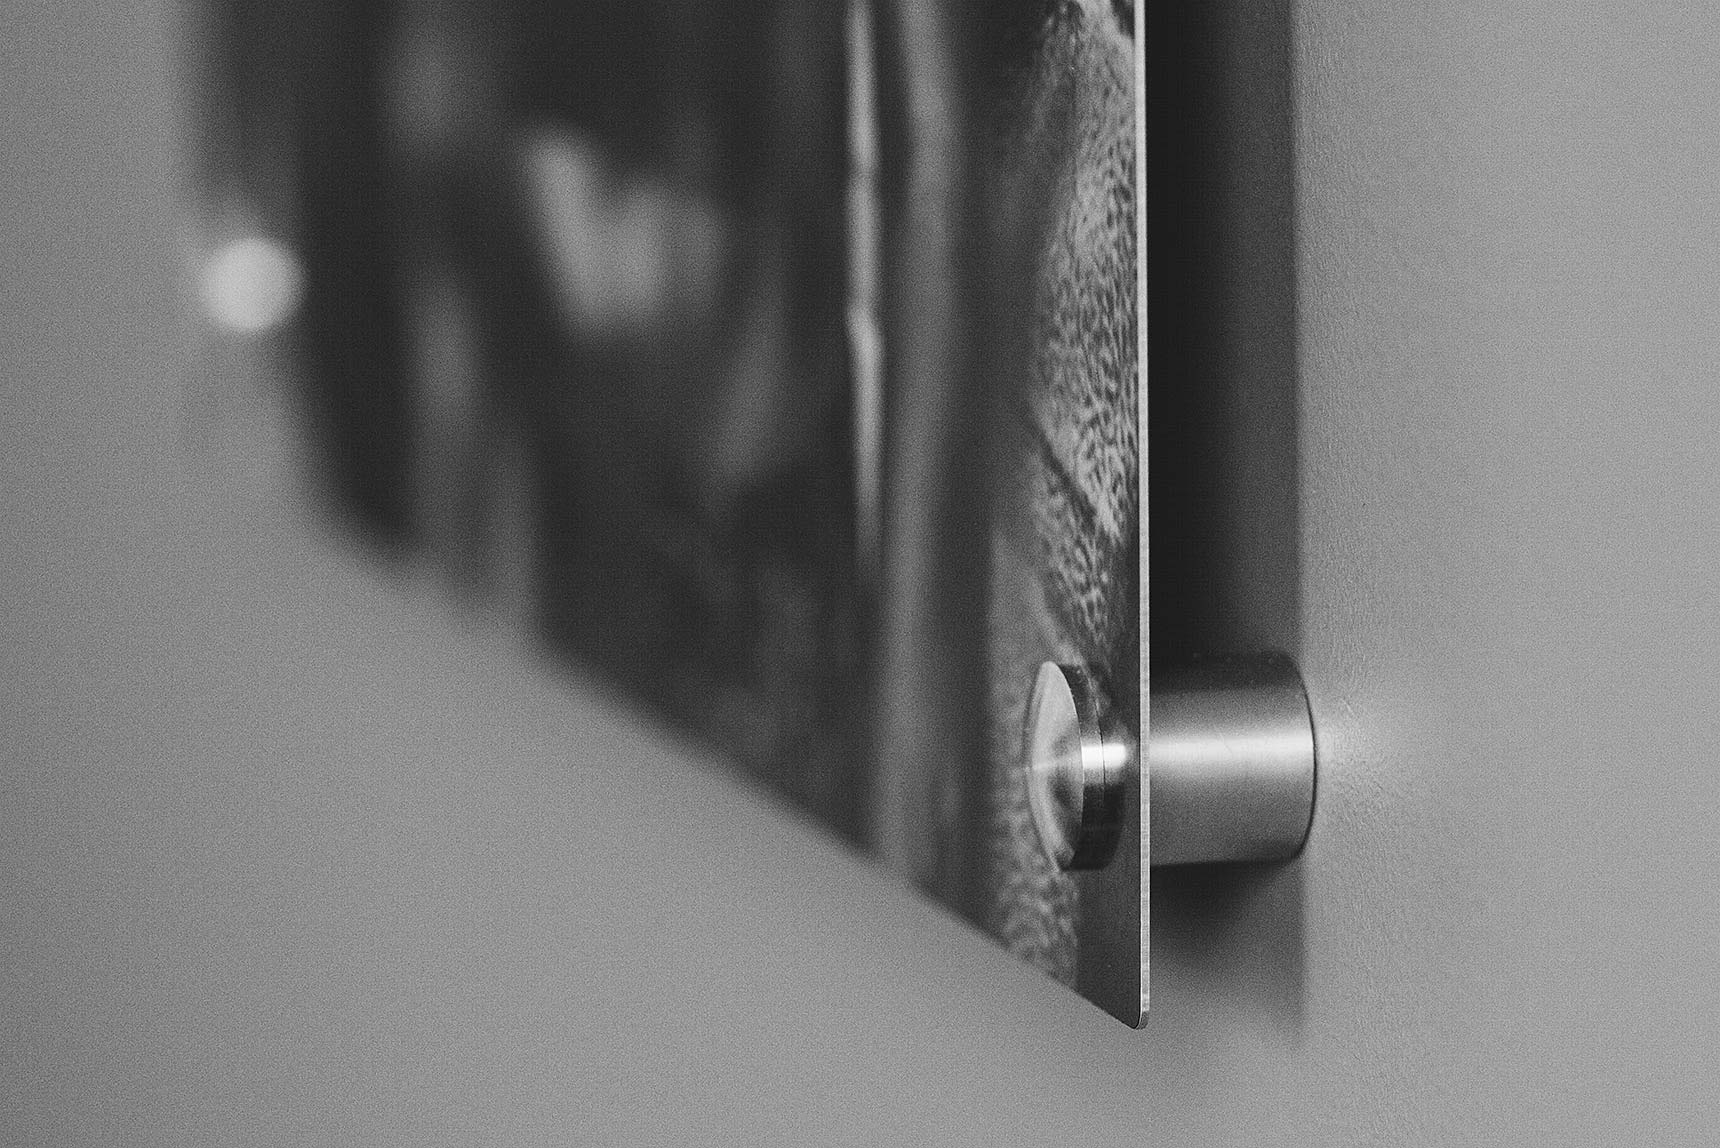 metal-luxury-boudoir-wall-portraits.jpg